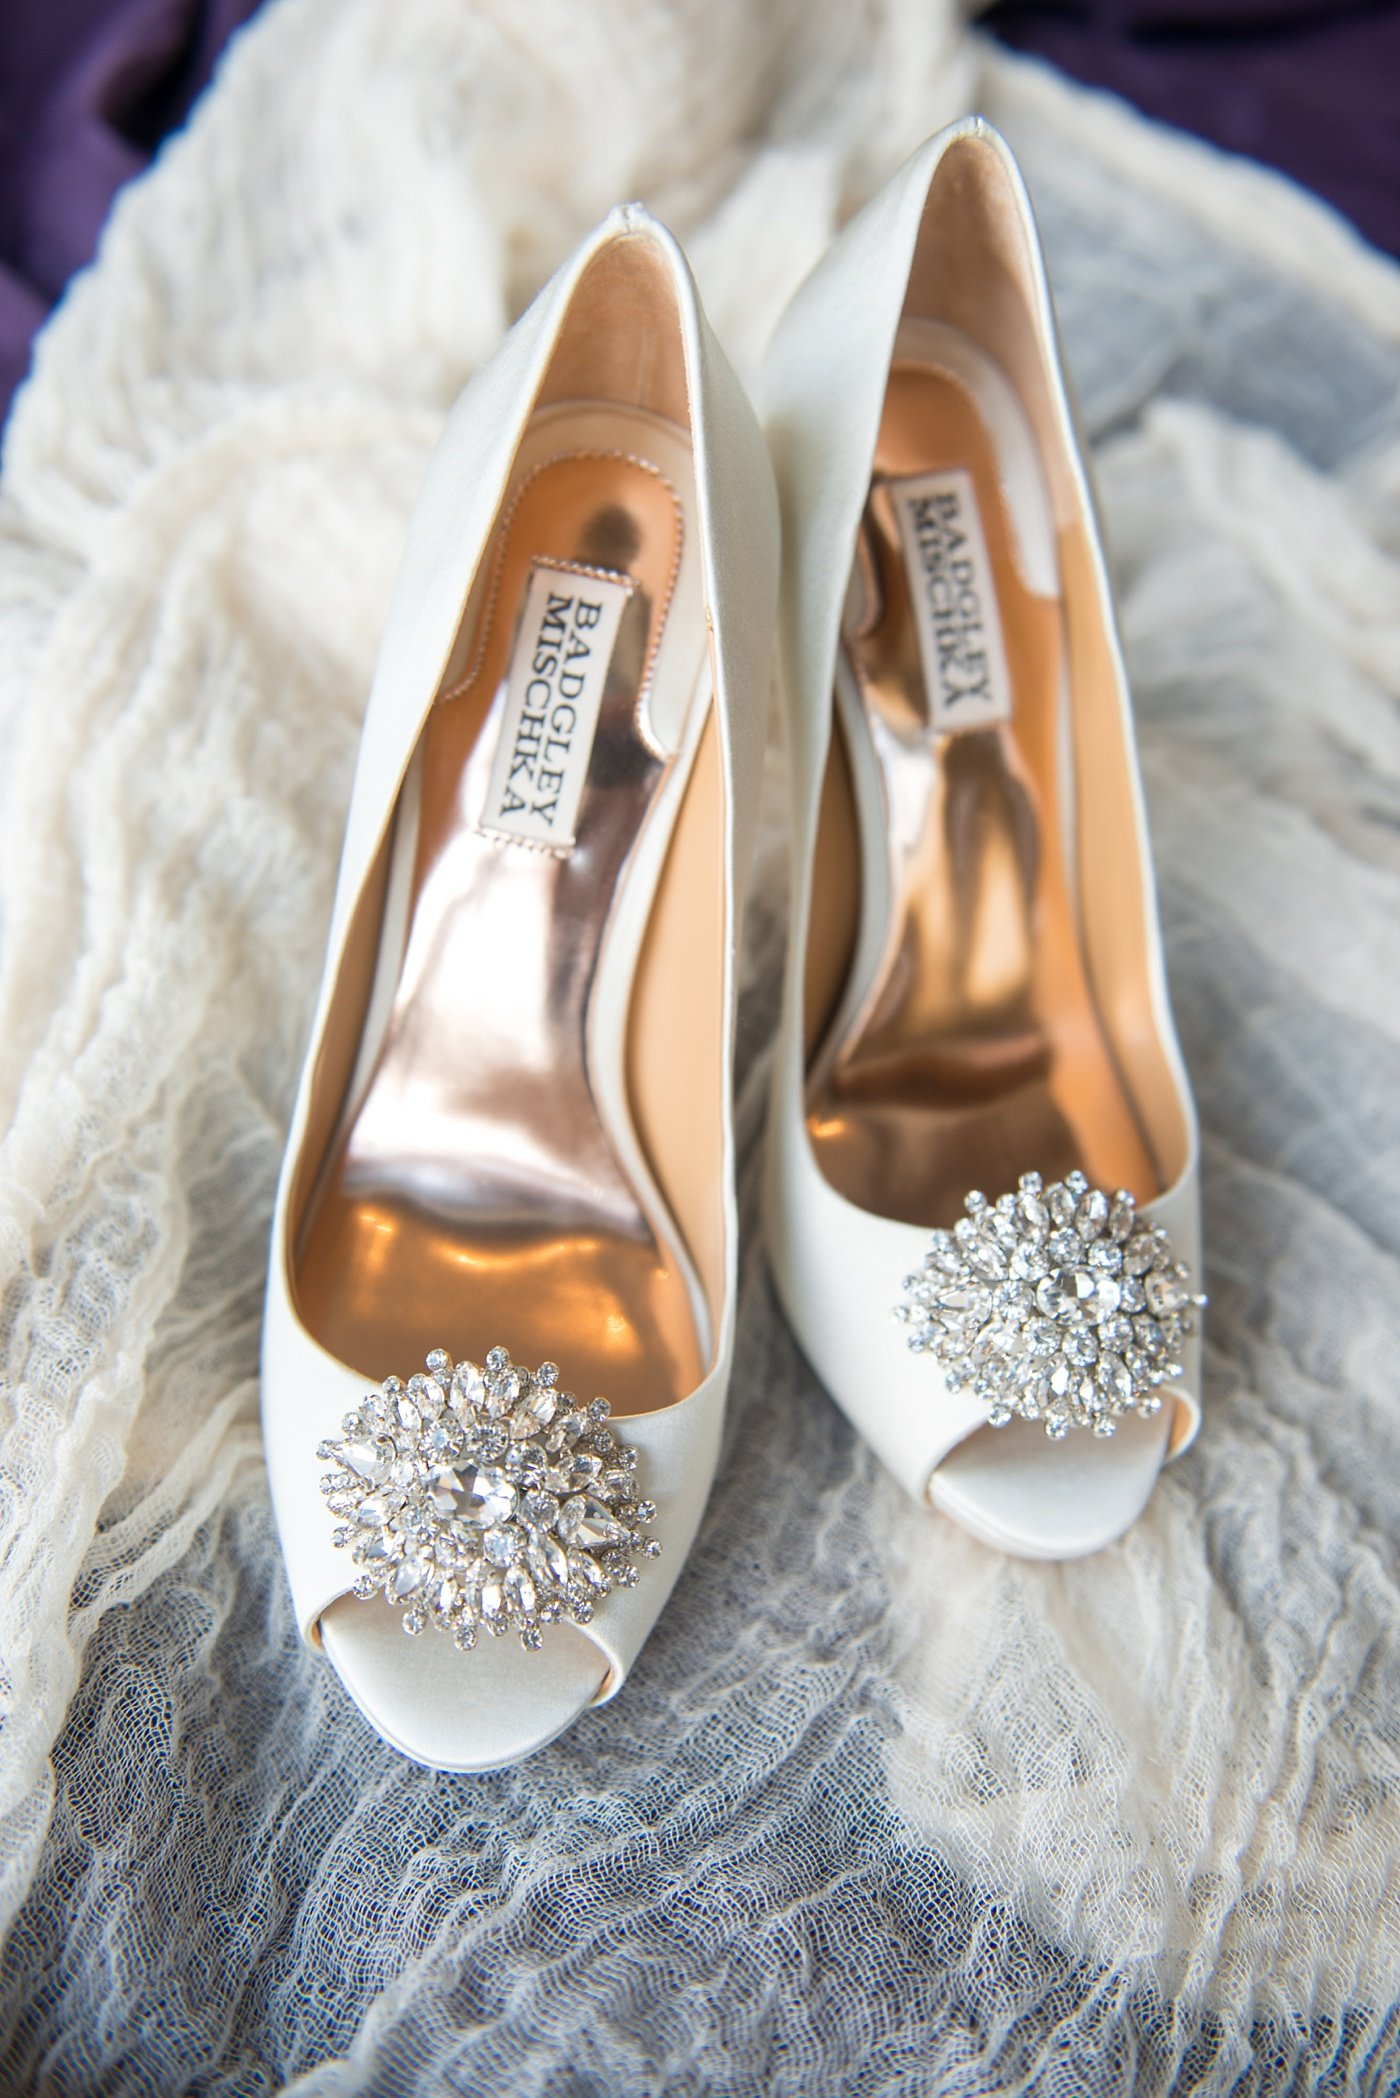 jewel-toned-wedding-inspiration-by-anna-mateo-photography-29